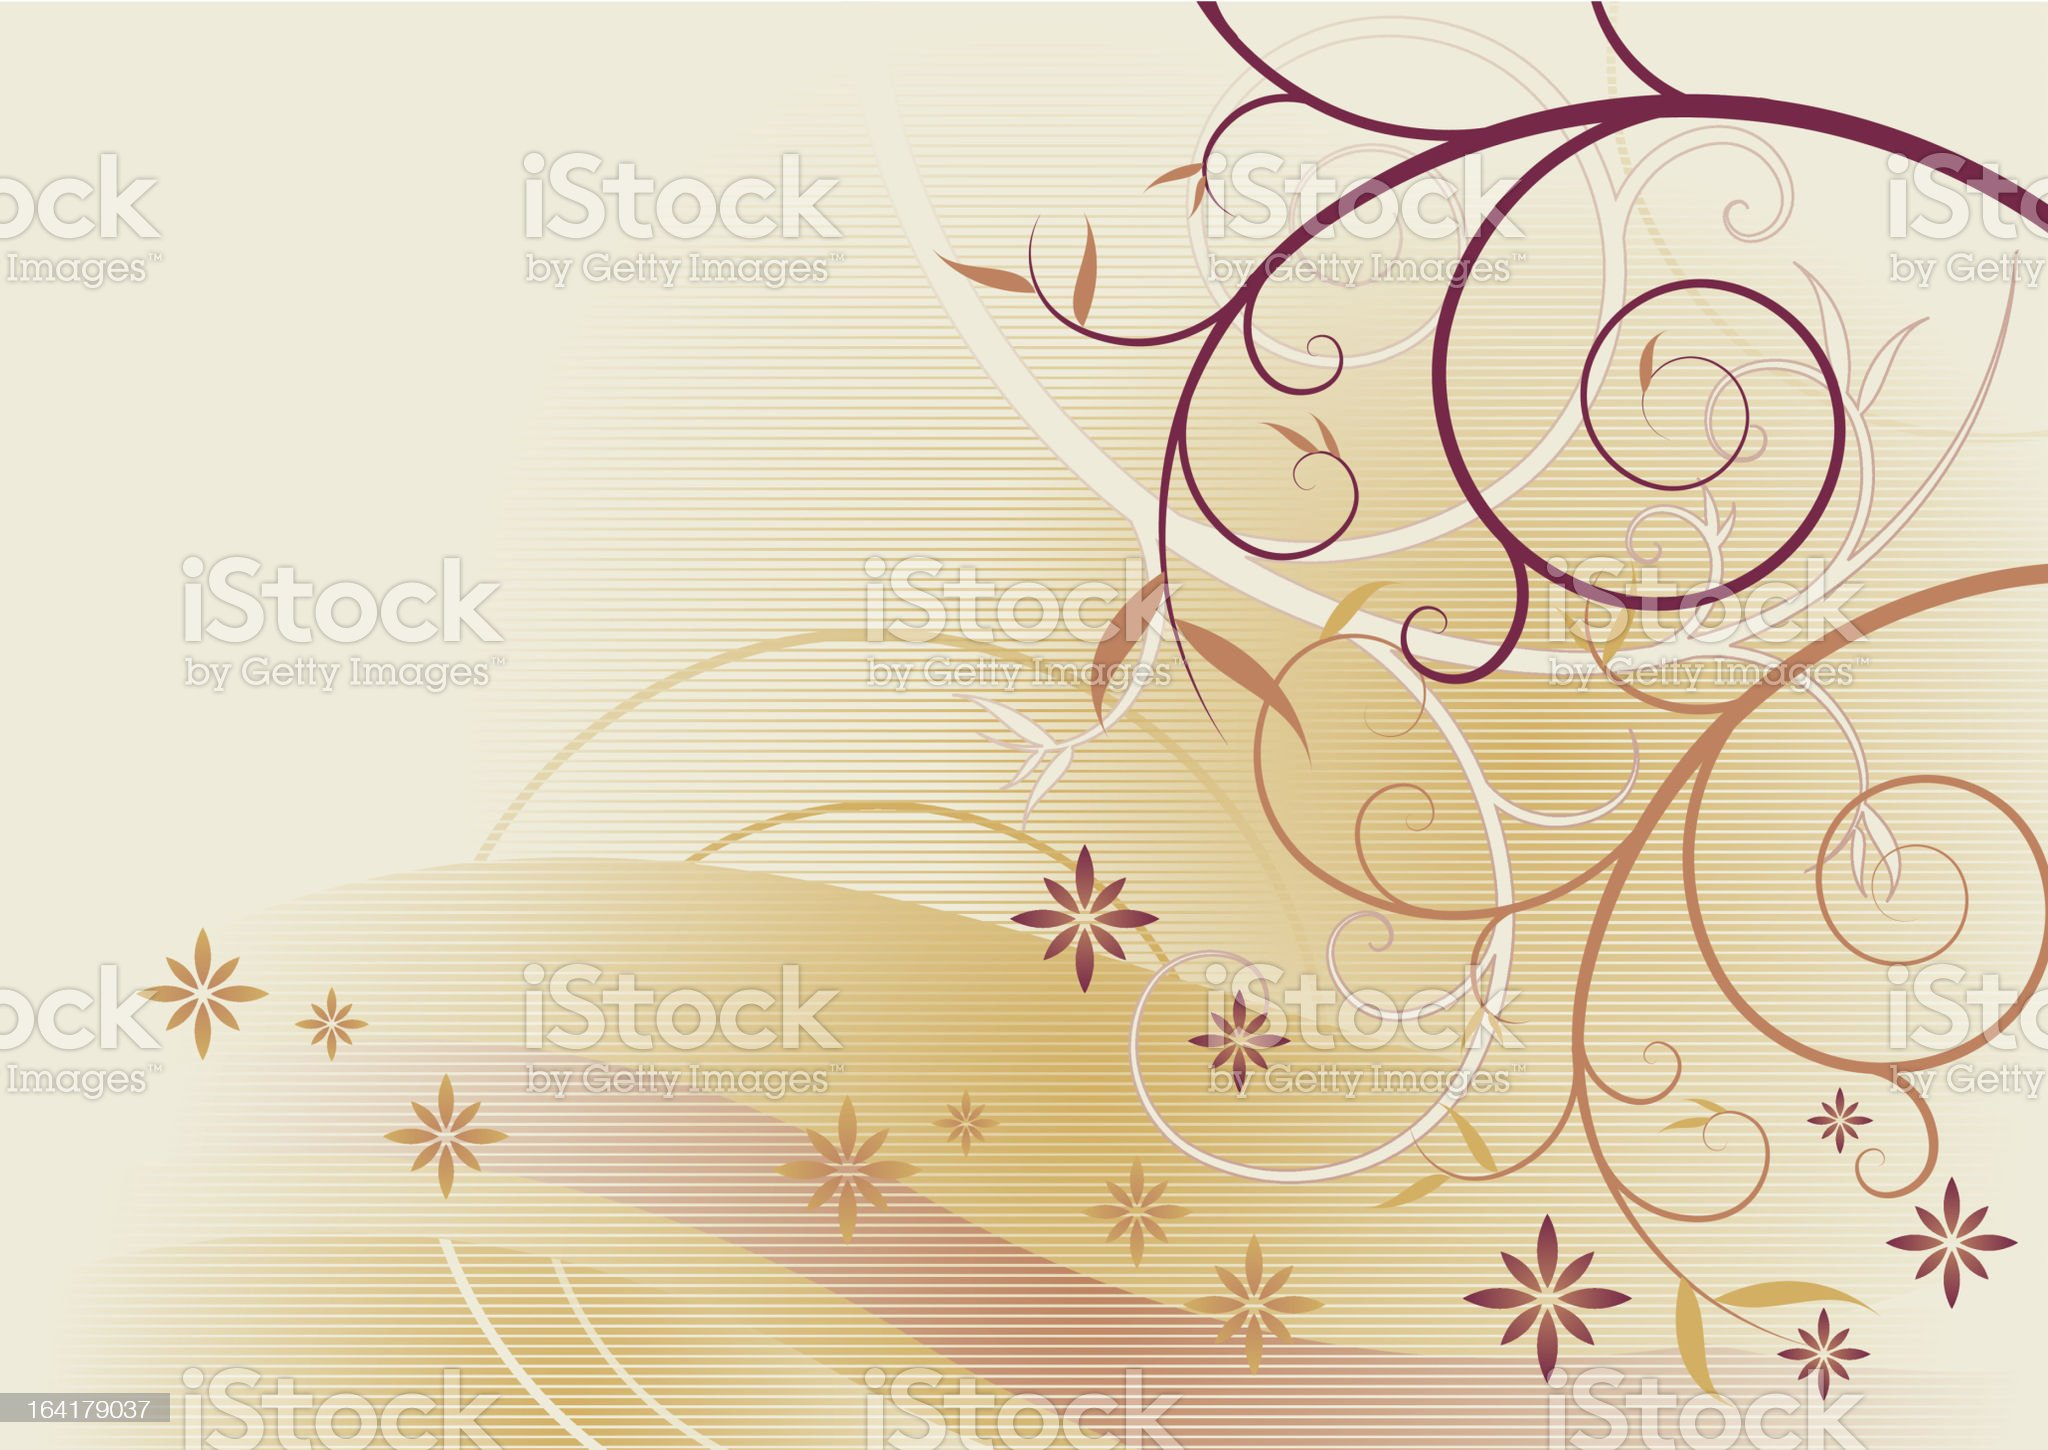 Spring flower spiral background royalty-free stock vector art